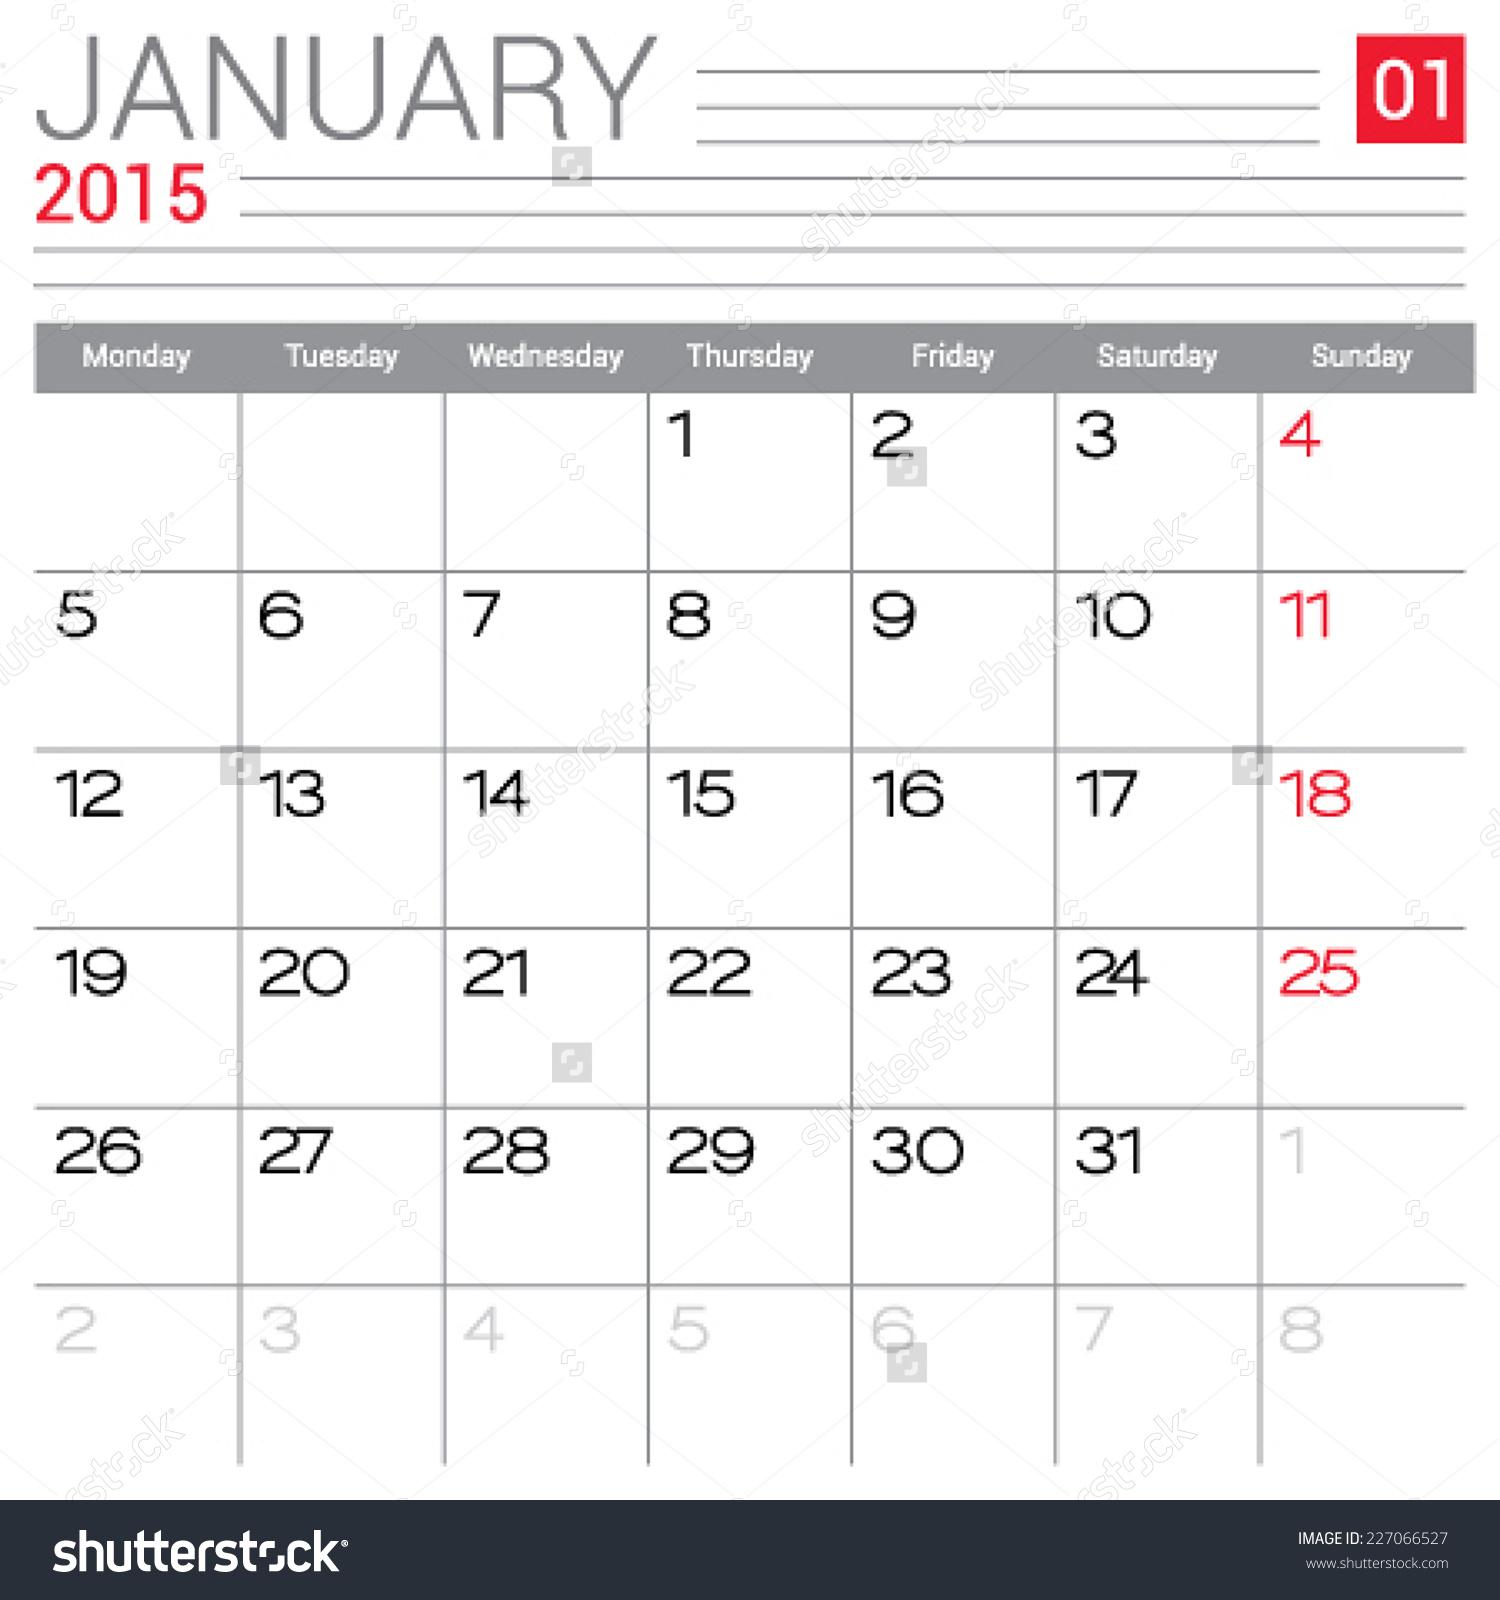 January 2015 Calendar Template Blank